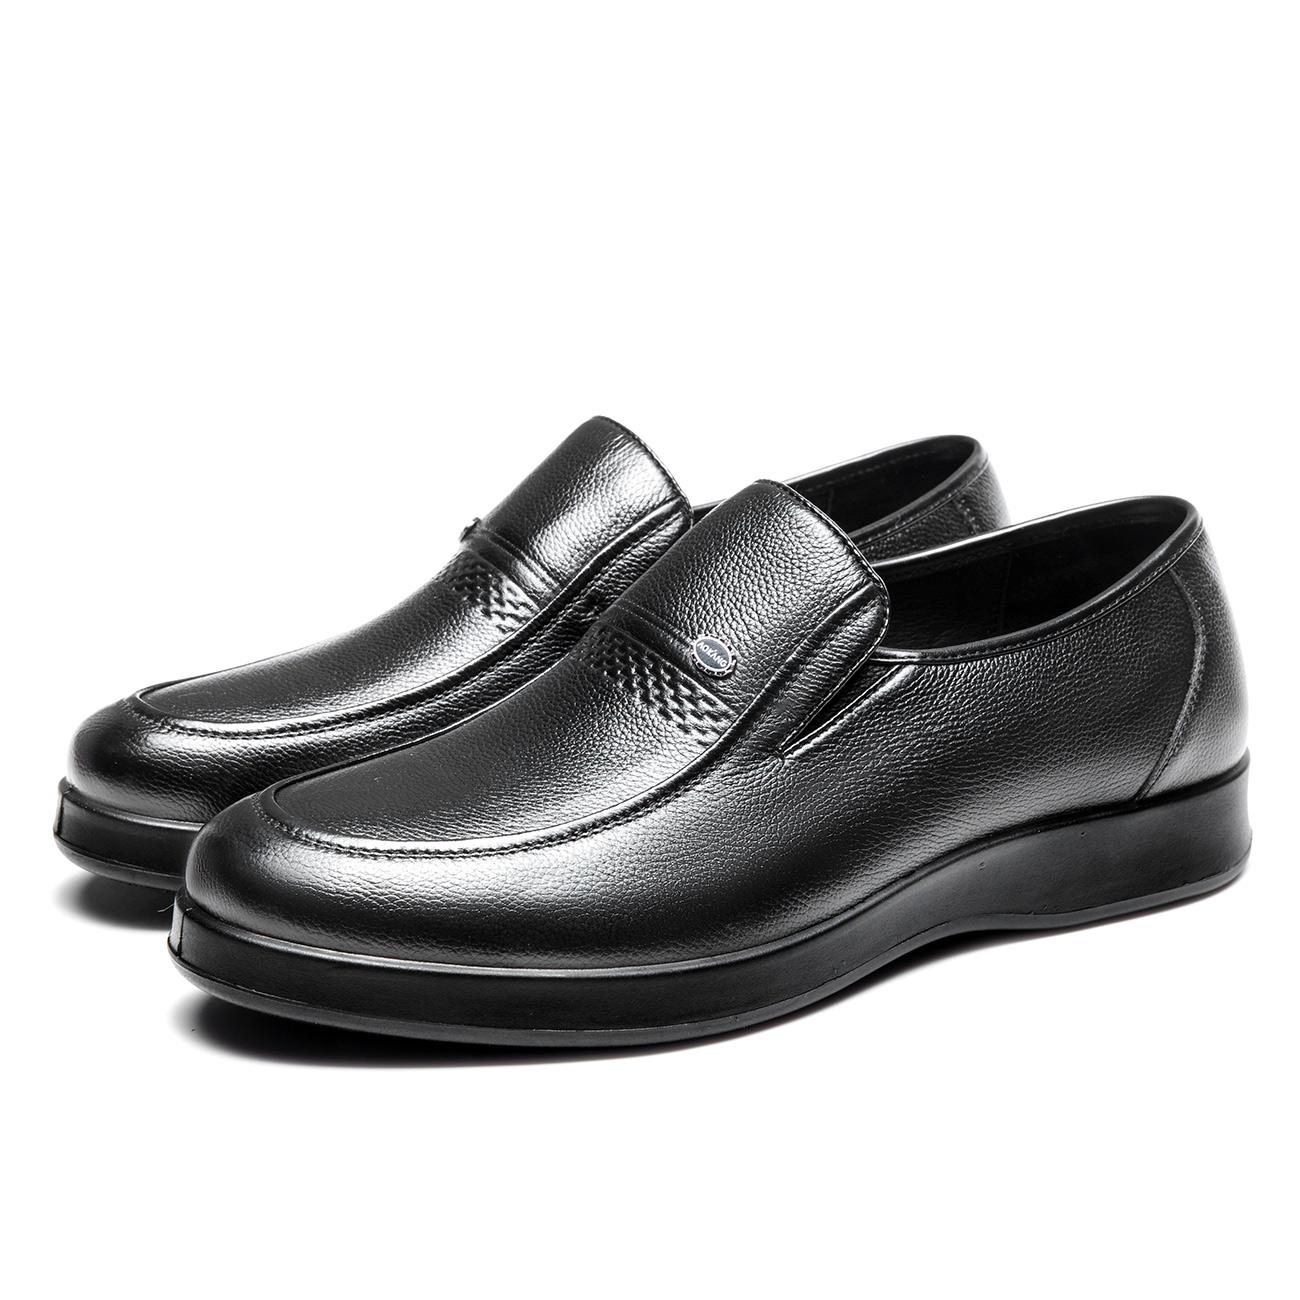 AOKANG 奥康 183331167 男士商务休闲鞋 黑色 40